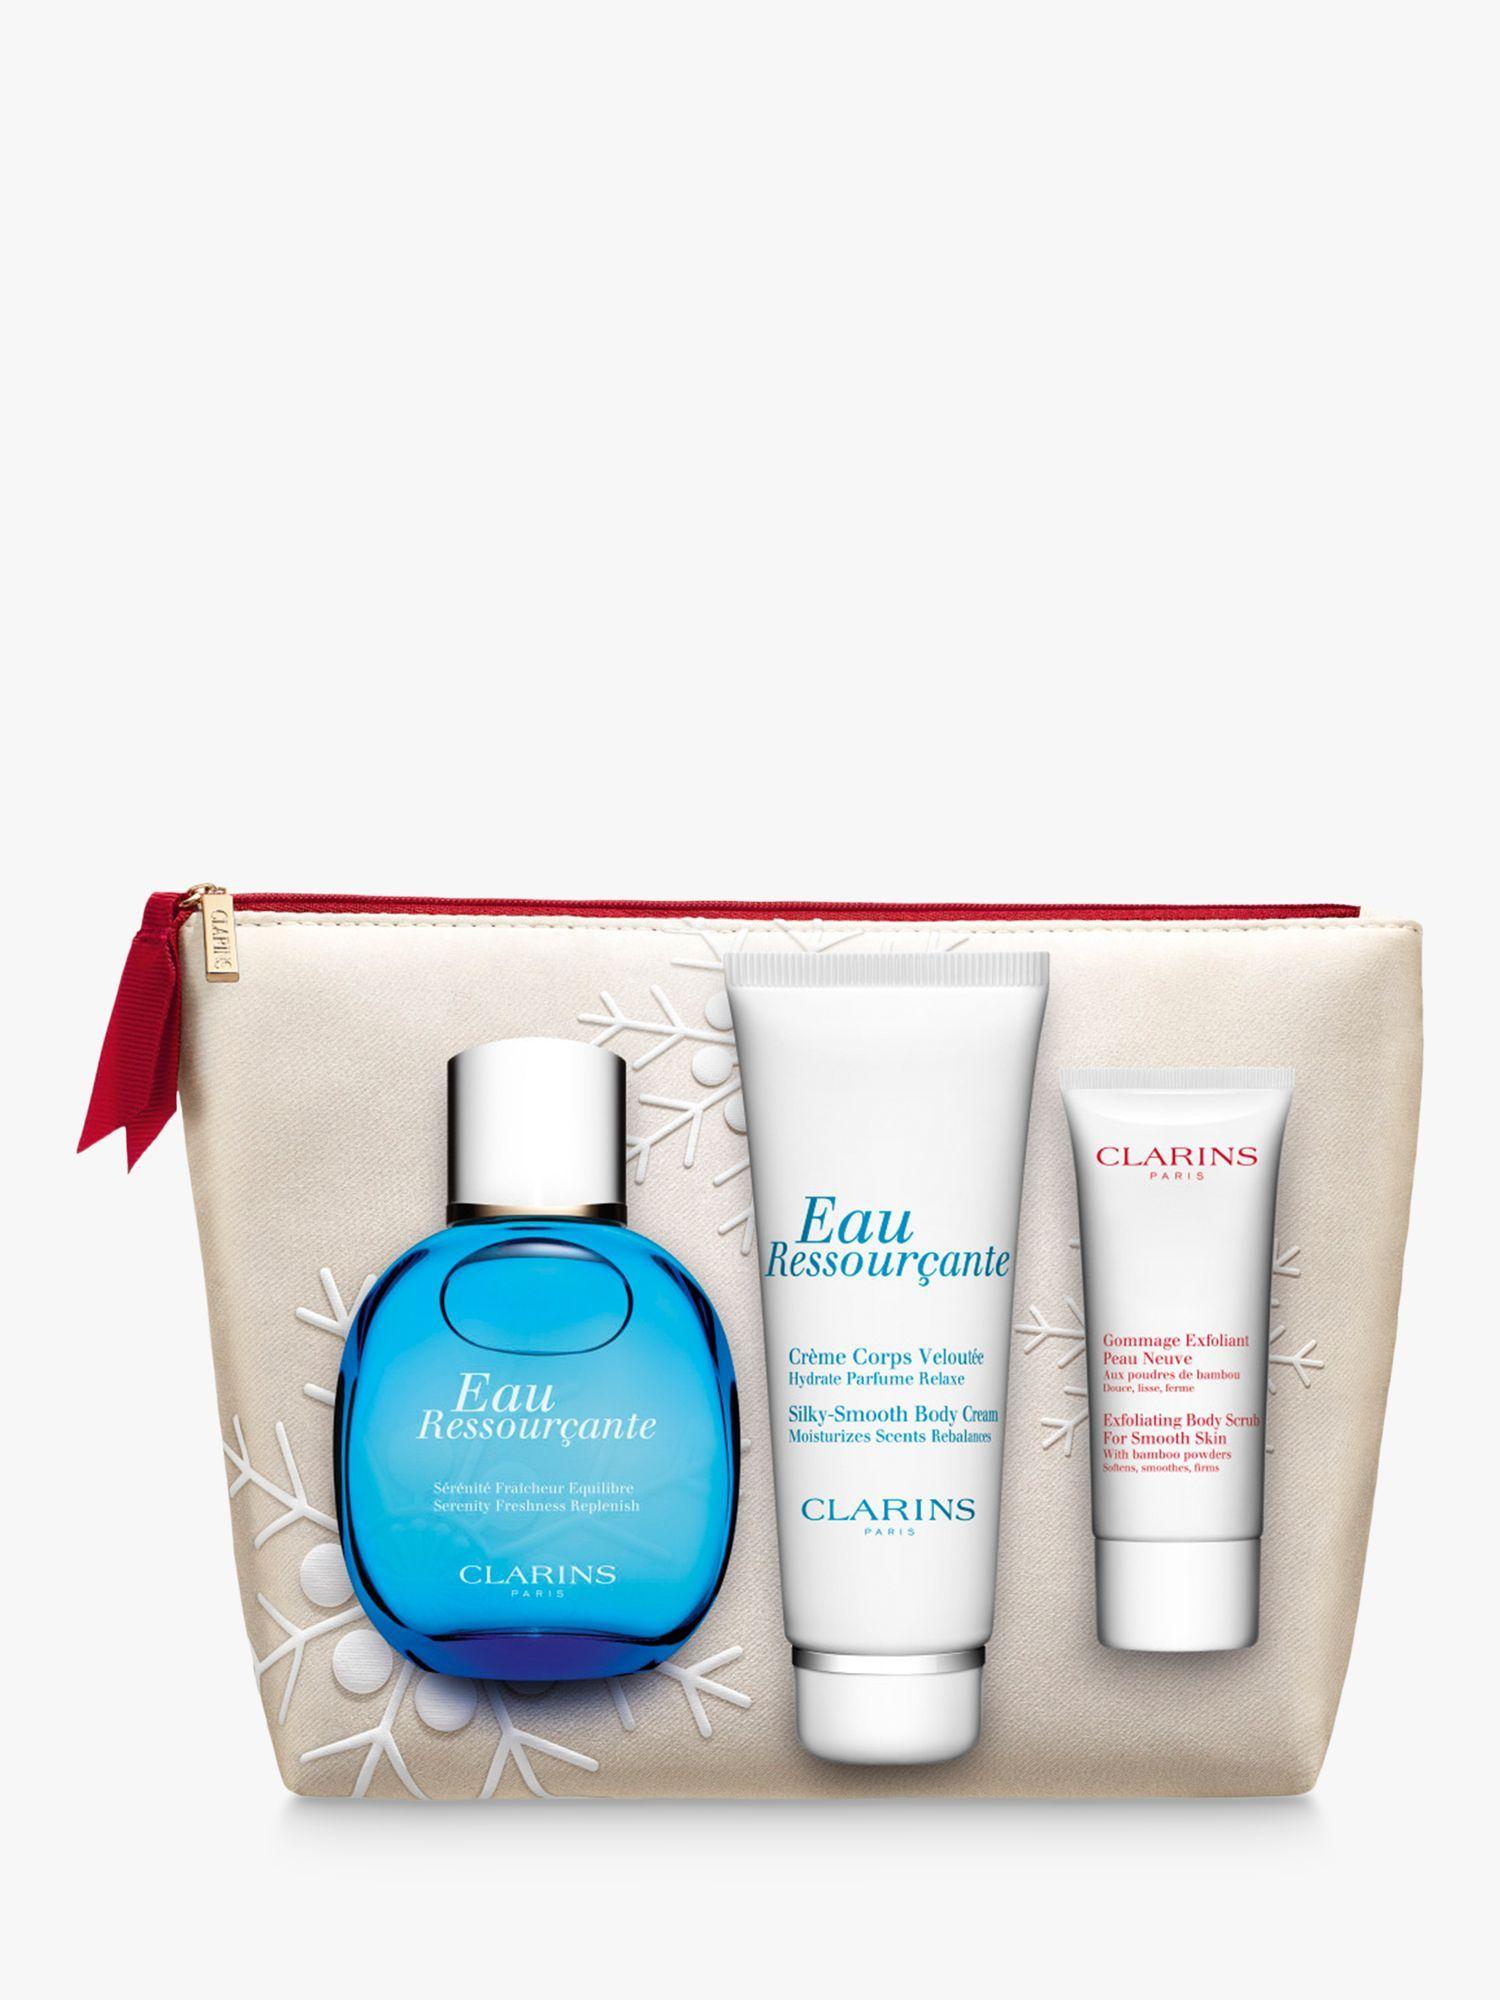 Clarins Eau Ressourçante Fragrance Gift